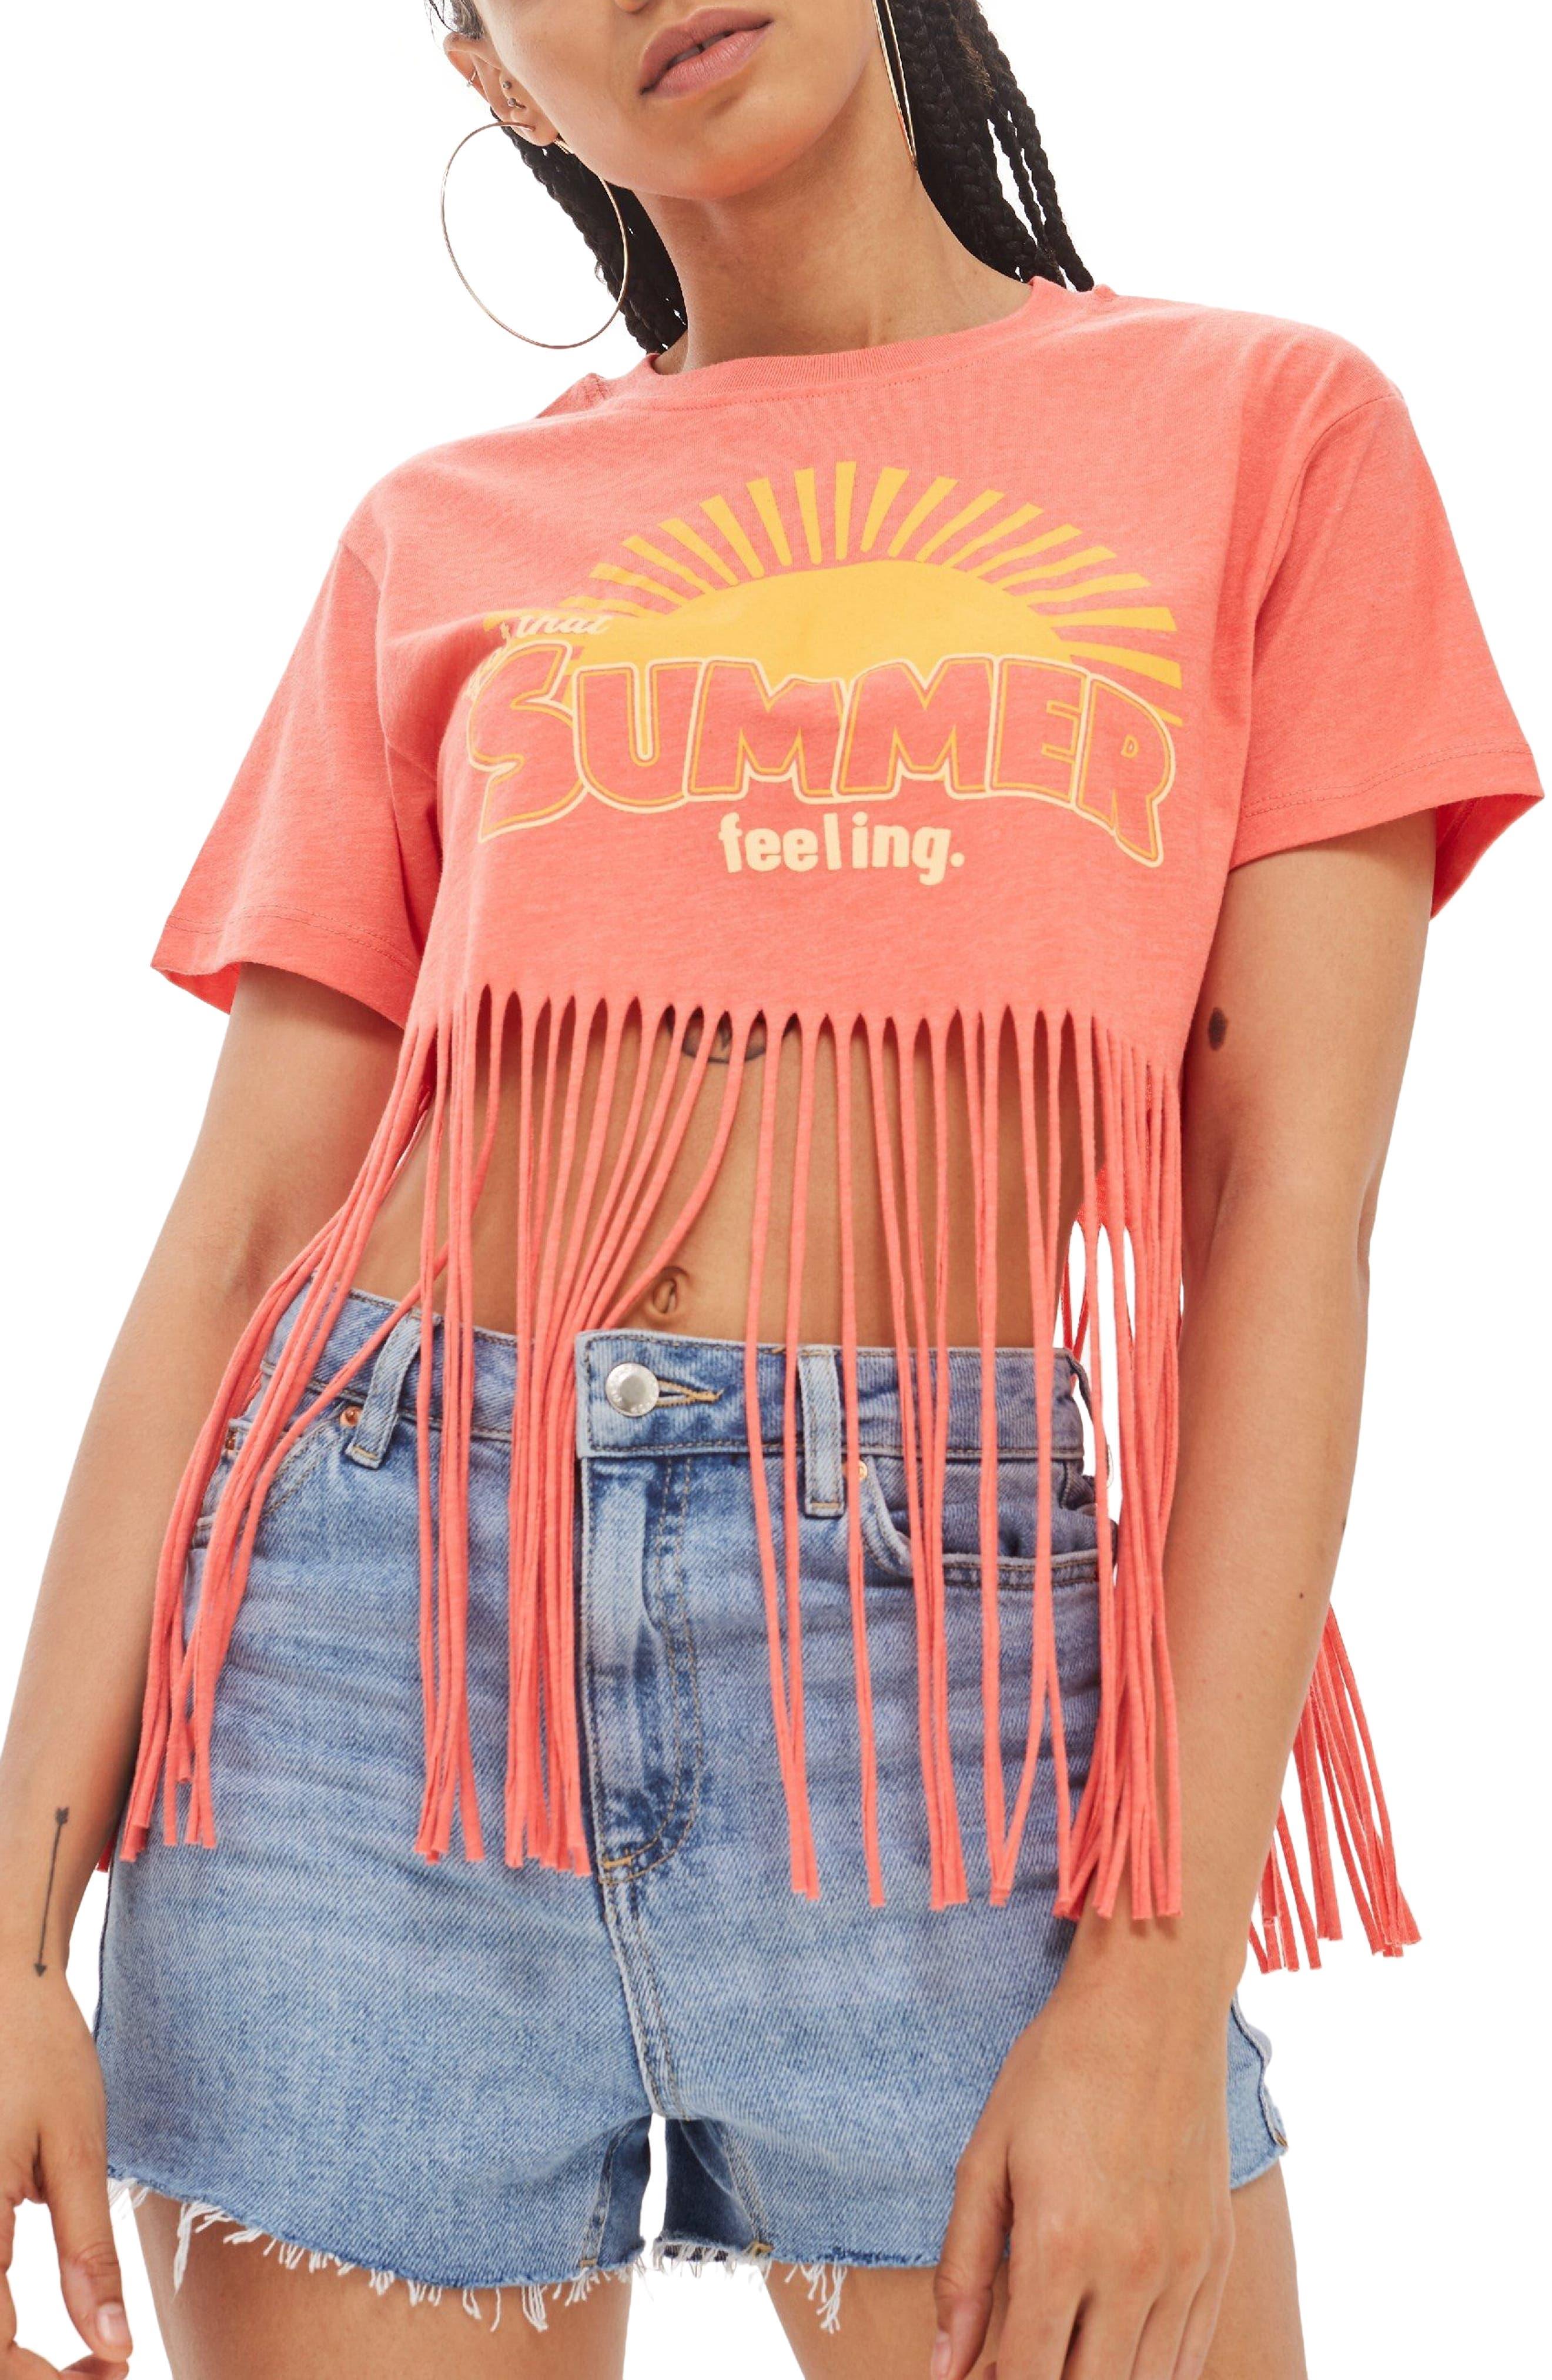 Summer Feelings T-Shirt,                             Main thumbnail 1, color,                             Pink Multi